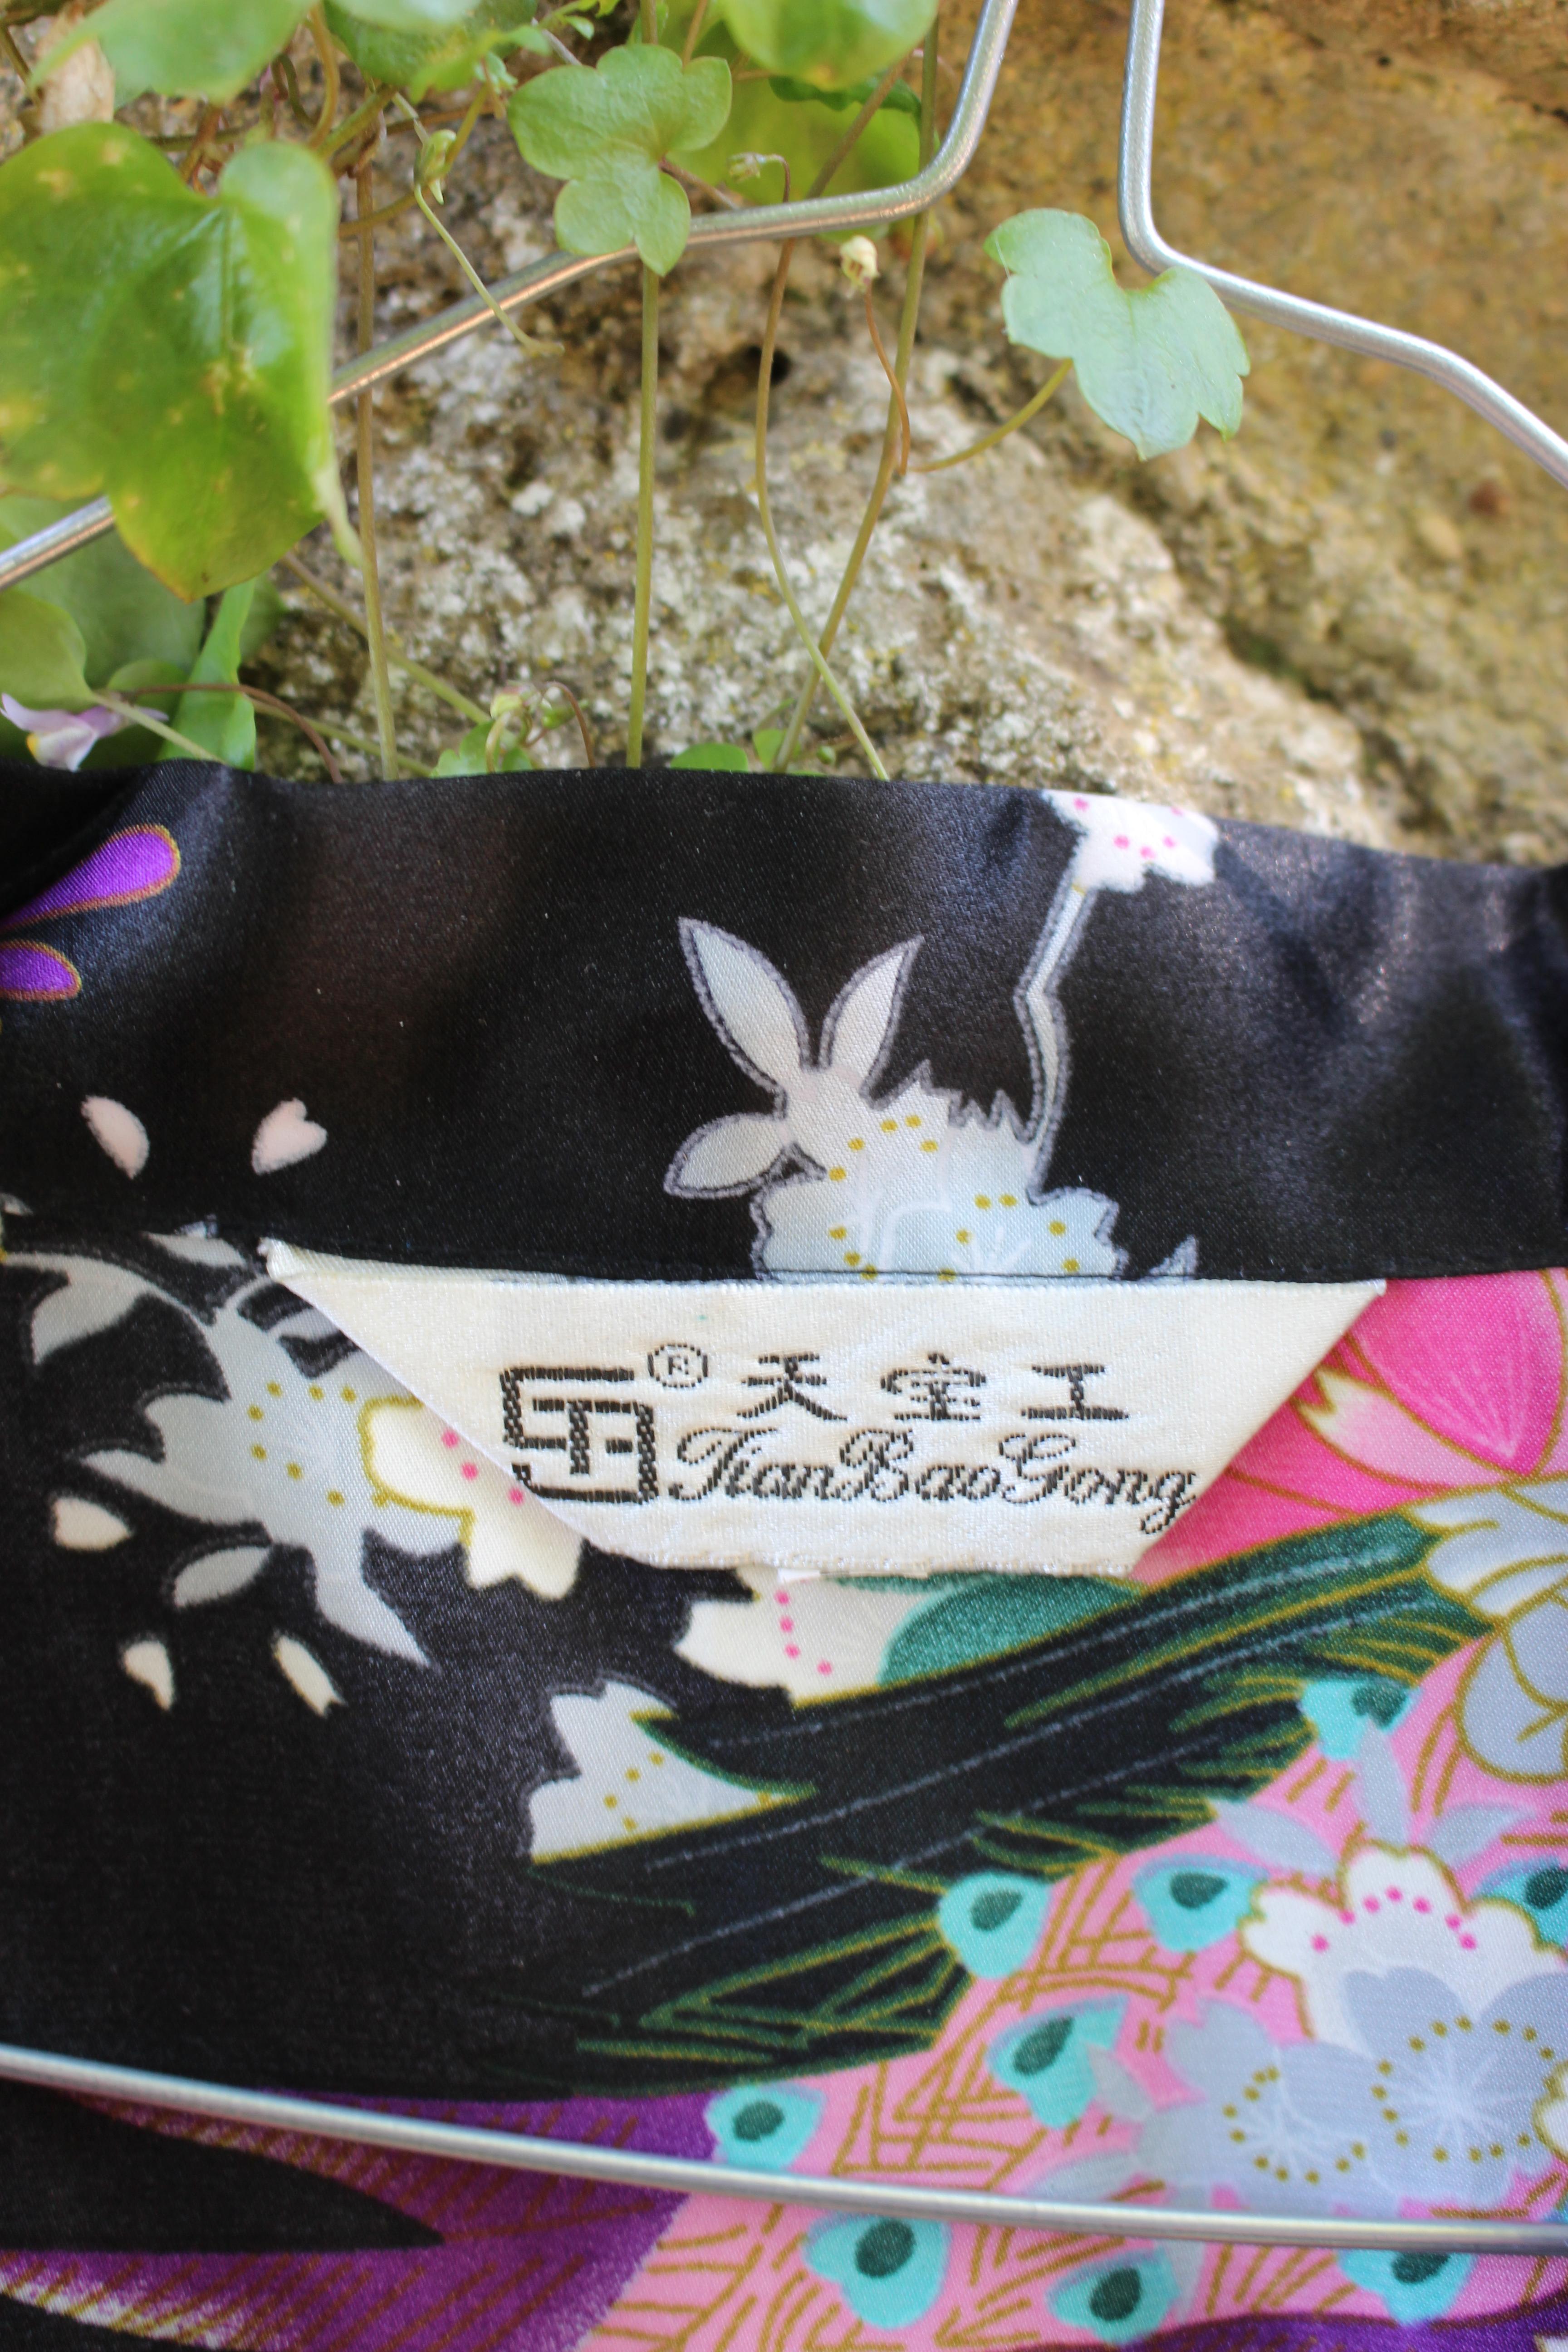 TianBaoGong peacock kimono, showing label